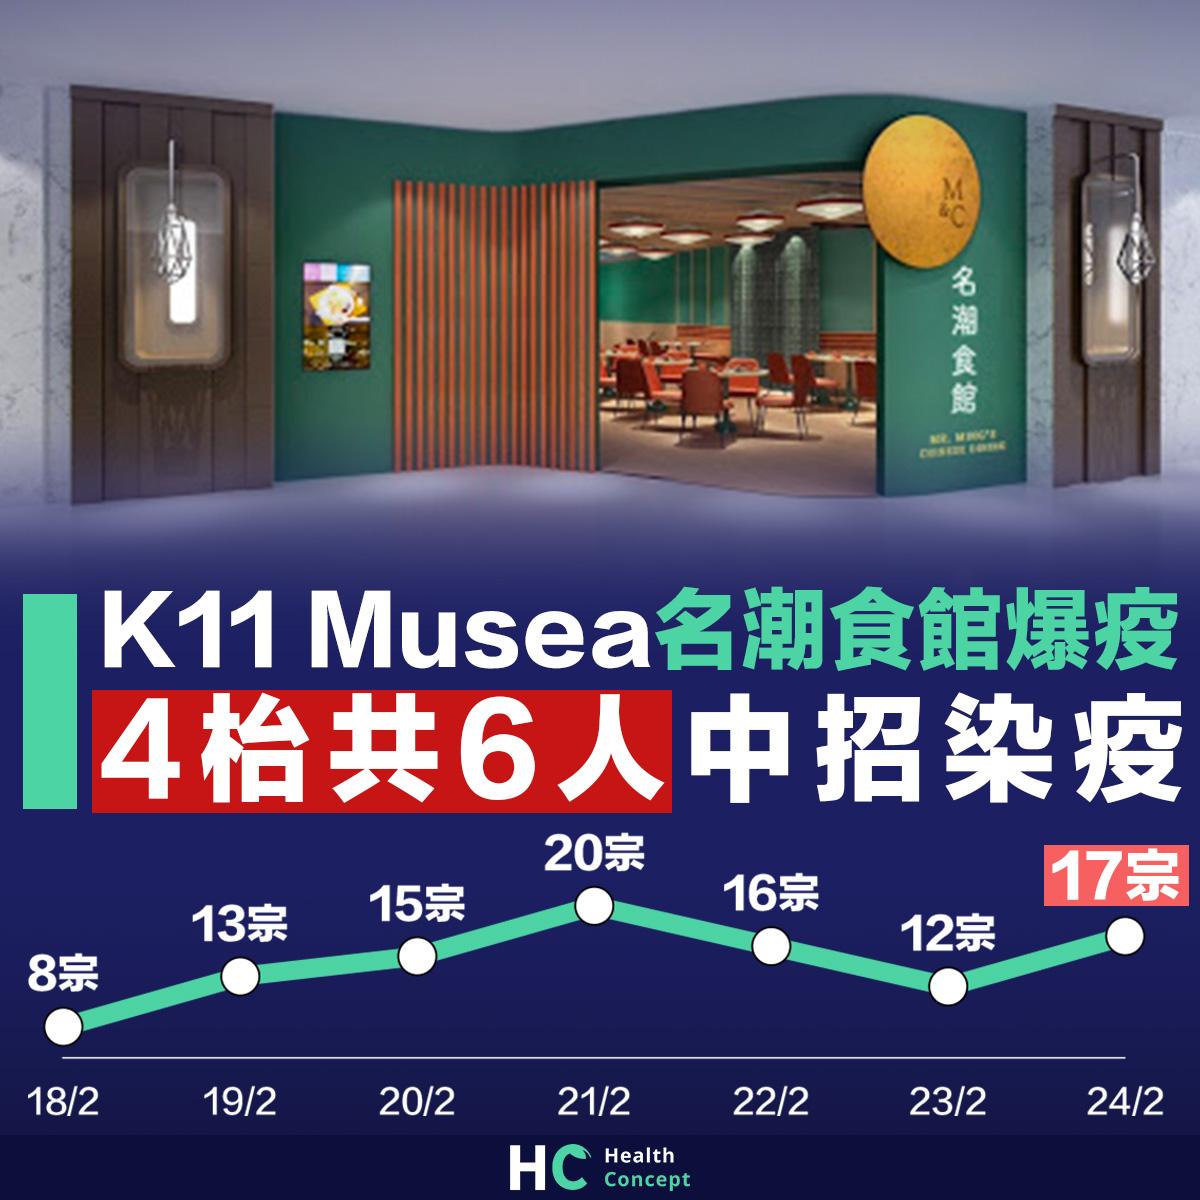 K11 Musea名潮食館爆疫 4枱6人中招